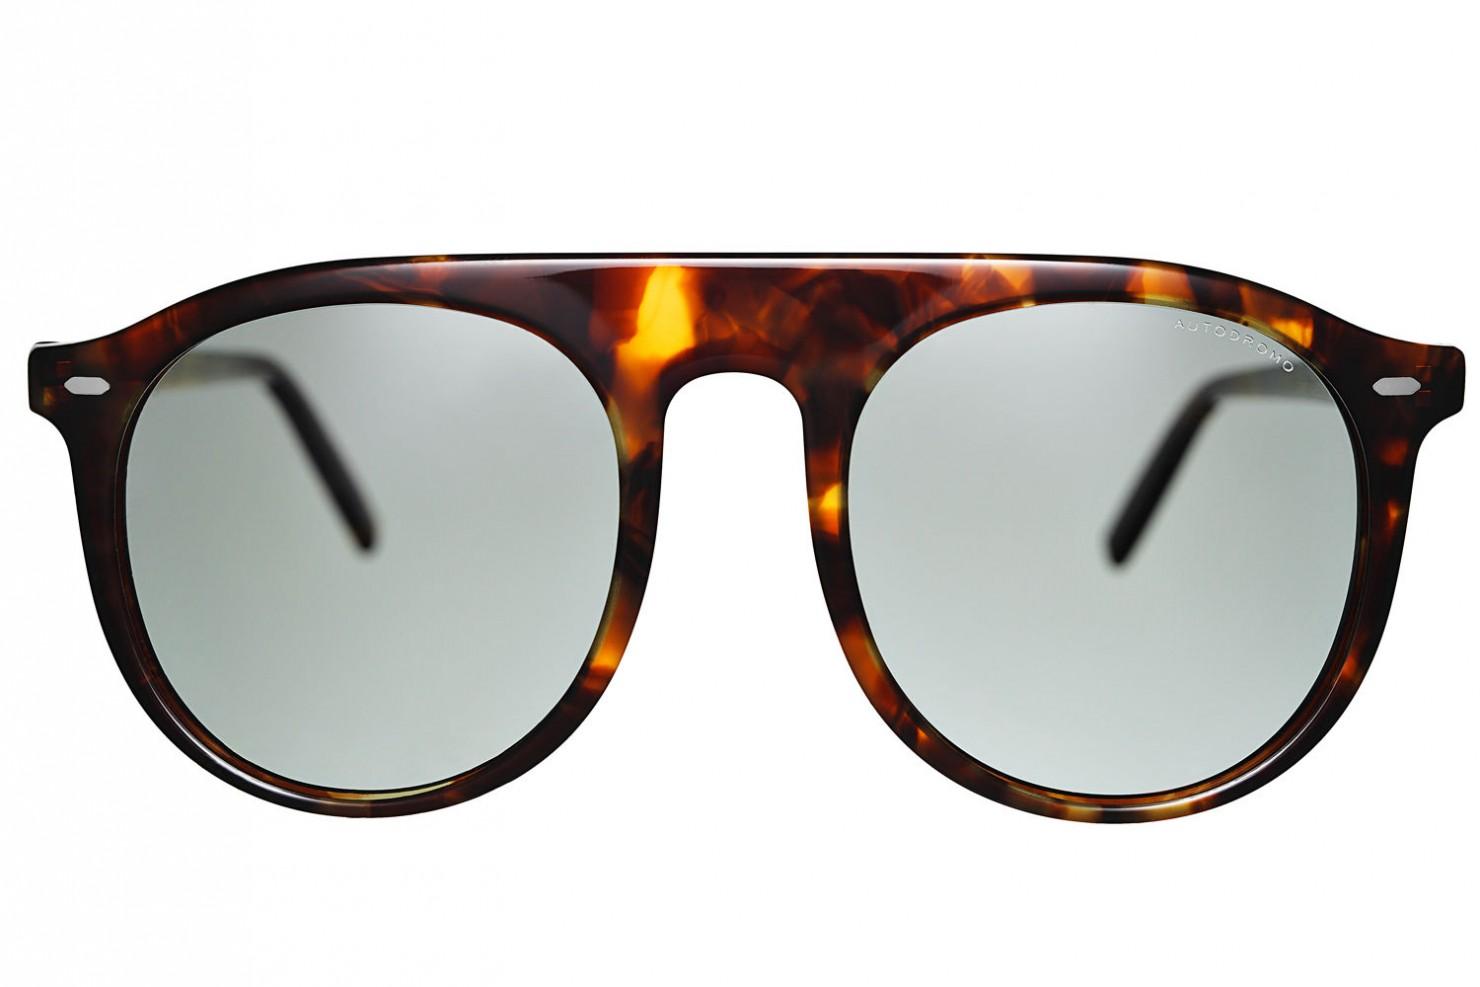 Stelvio Sunglasses by Autodromo